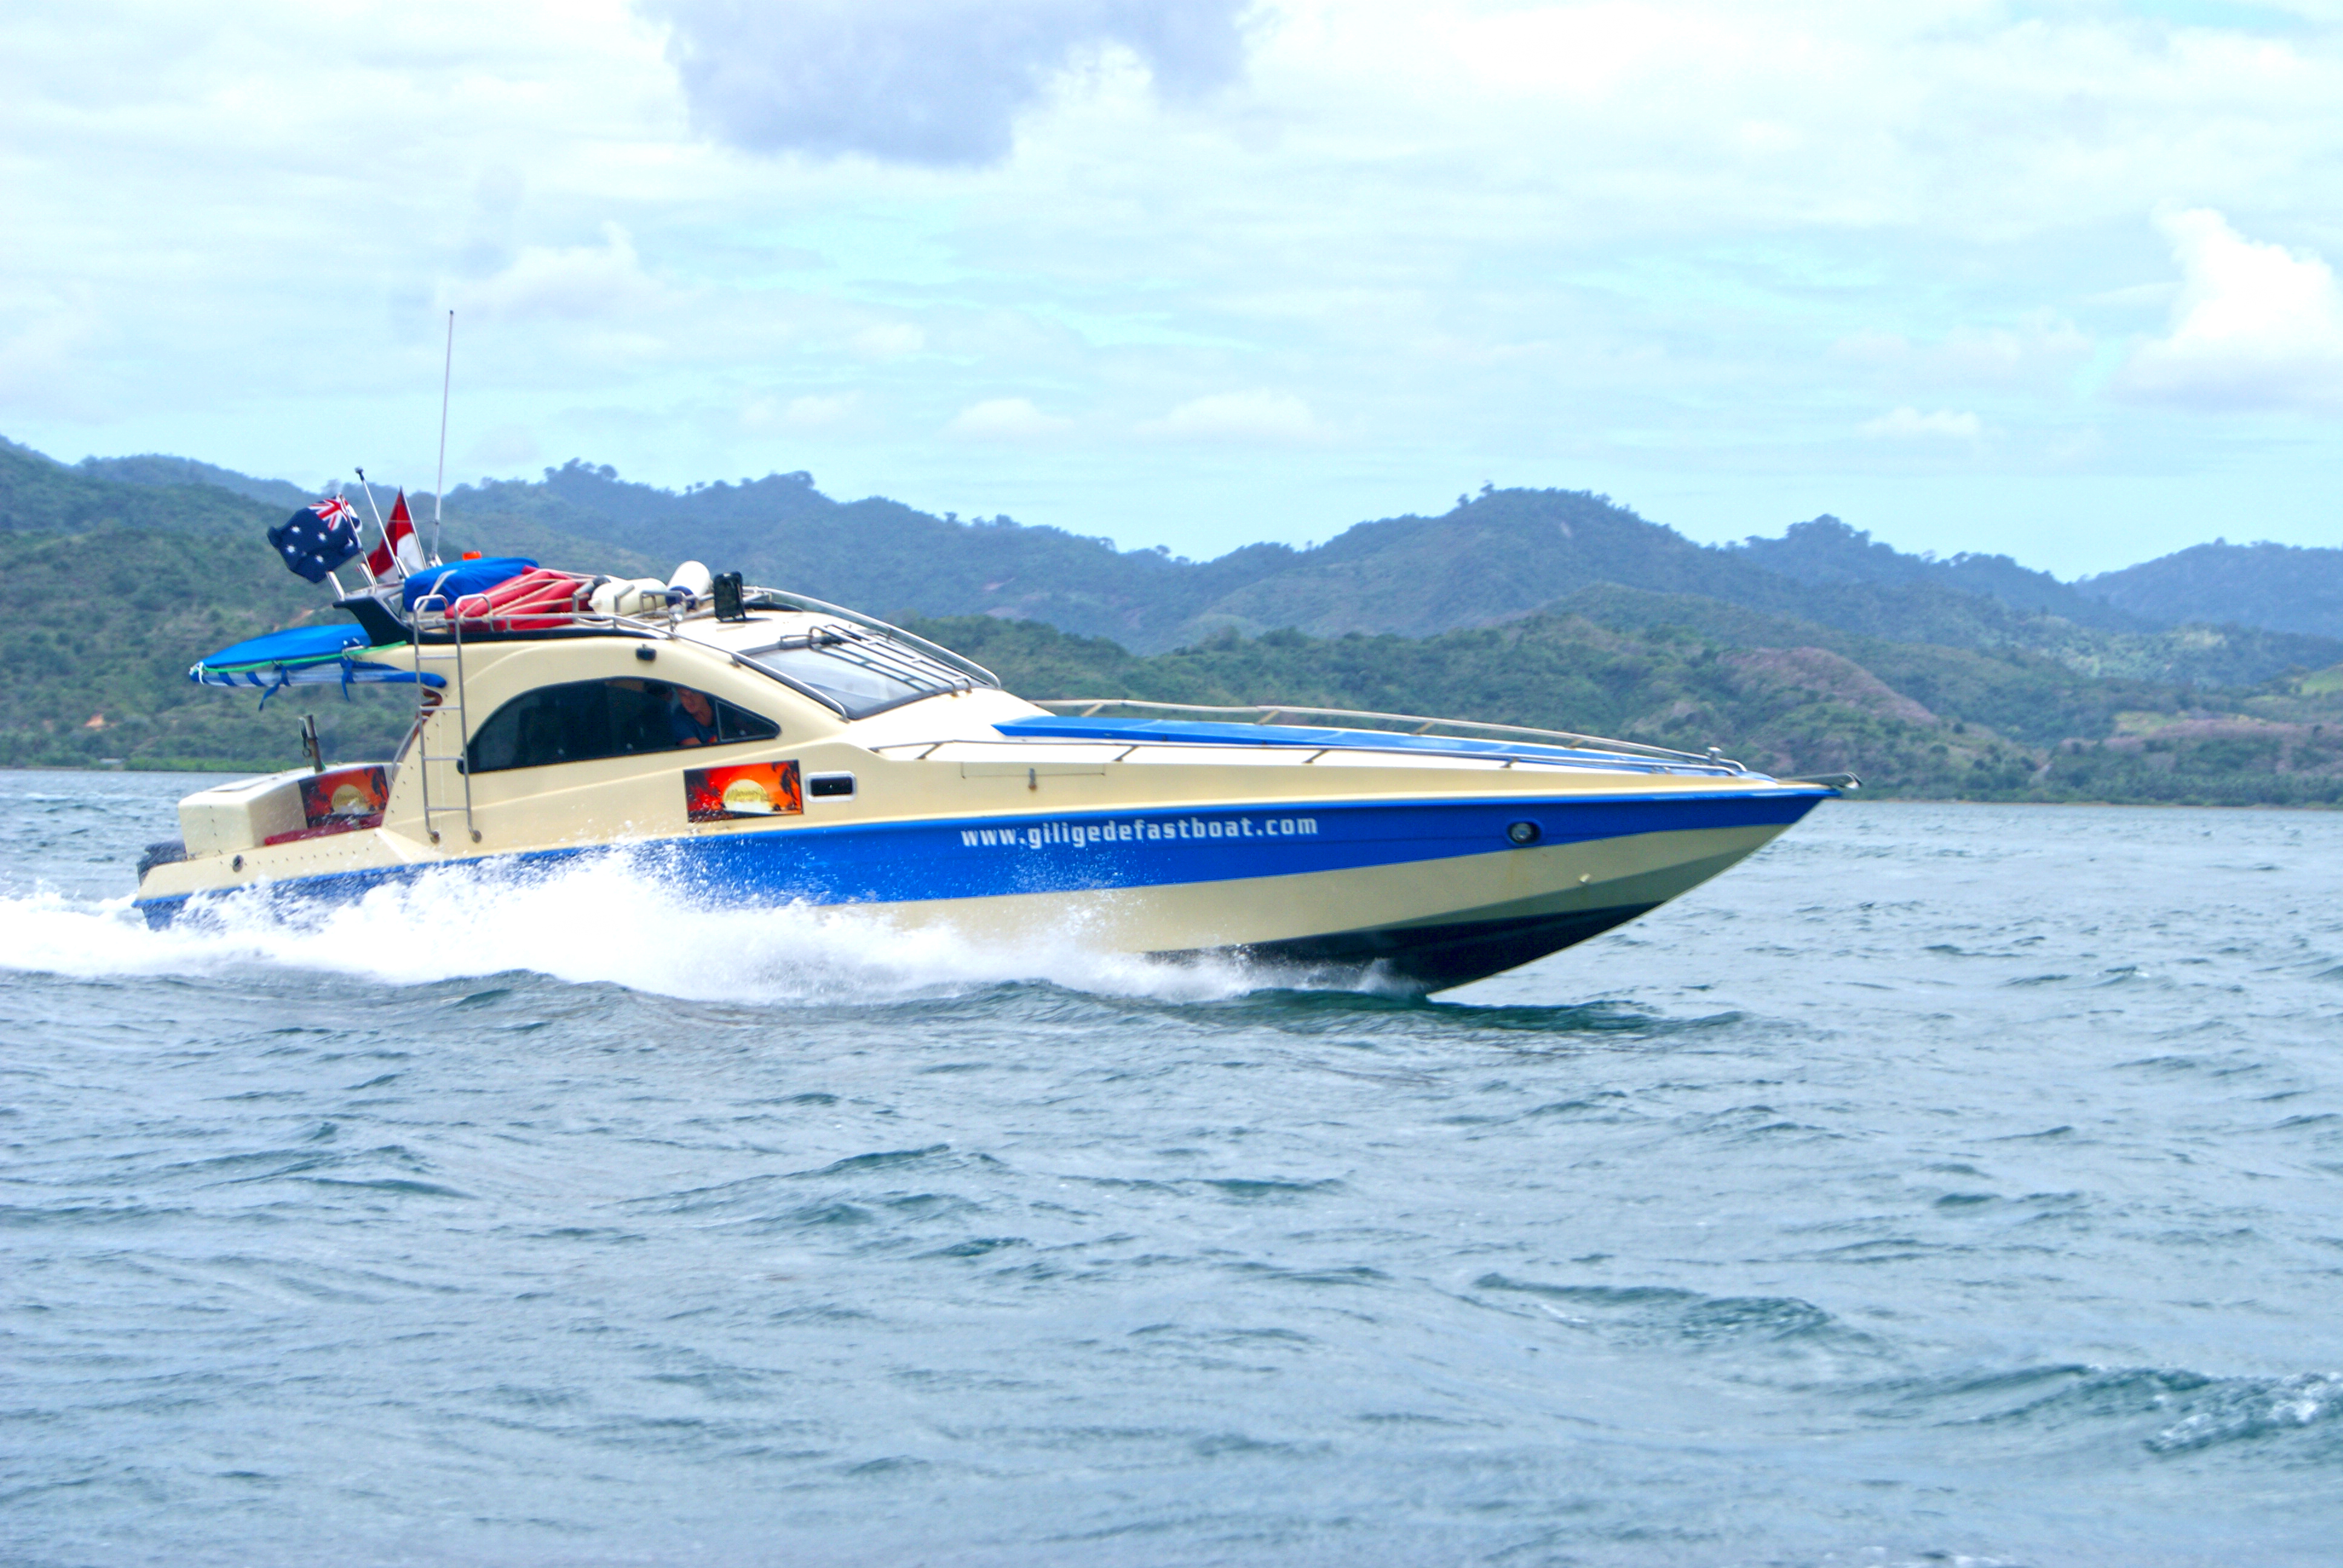 Gili Gede Fast Boat